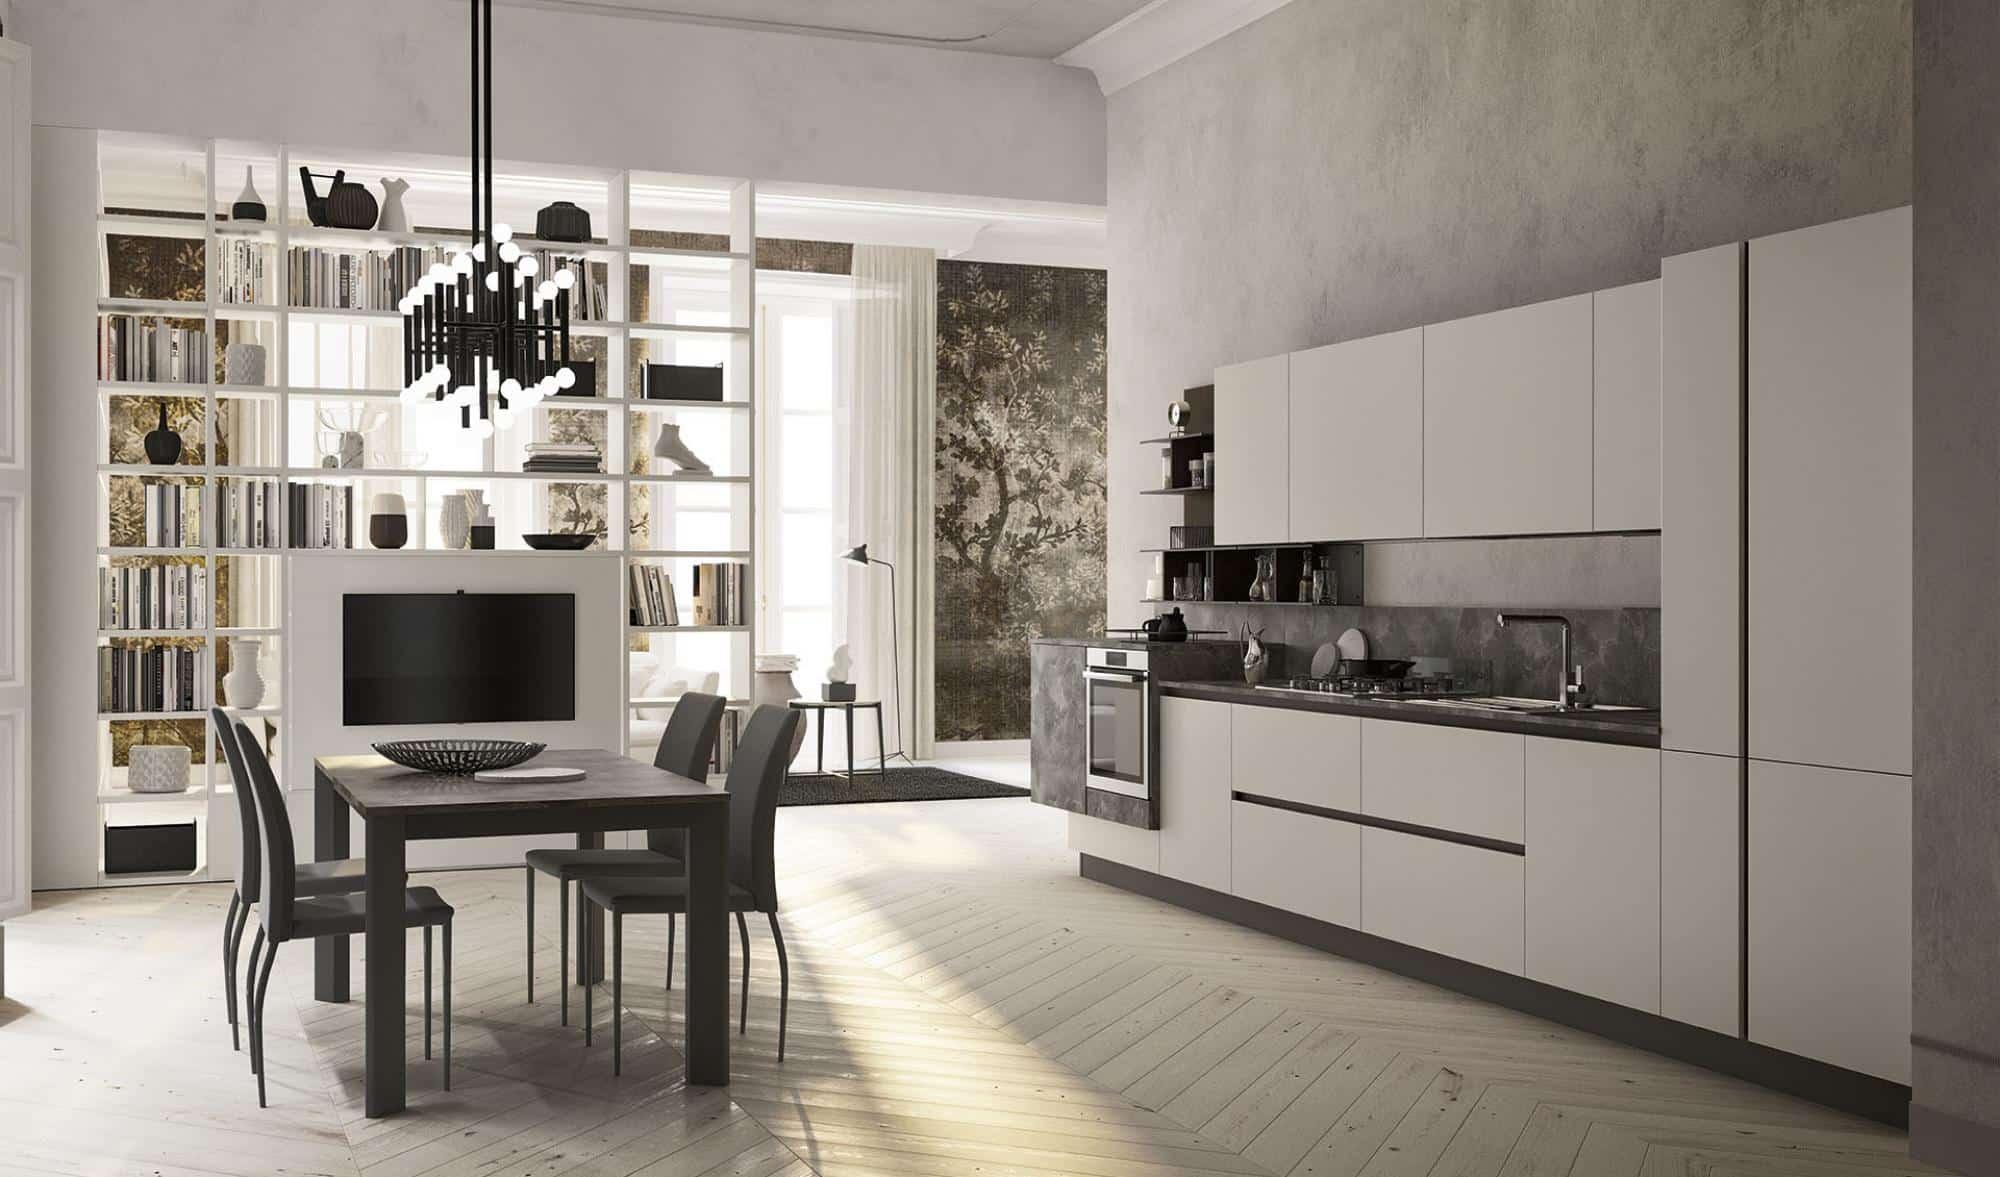 Lungomare κουζινα χωρις πομολο λευκό ματ και μάρμαρου